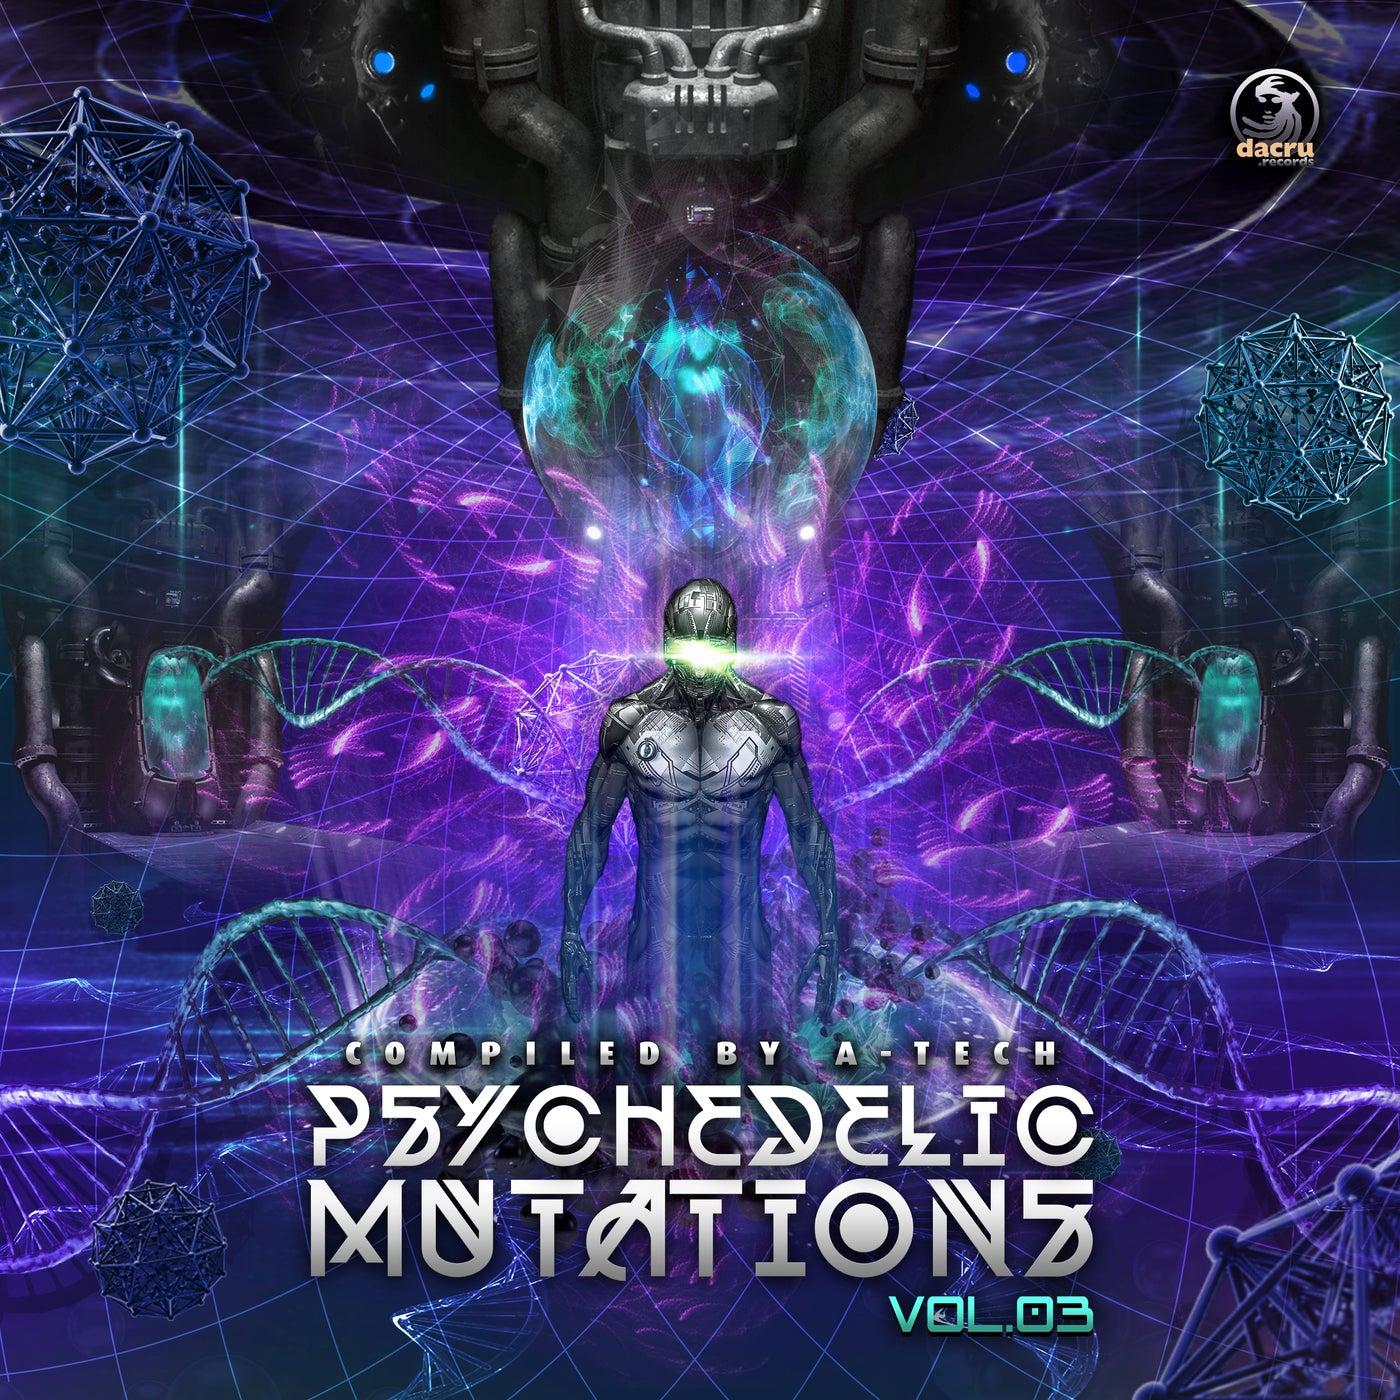 Analog Mutation (Original Mix)